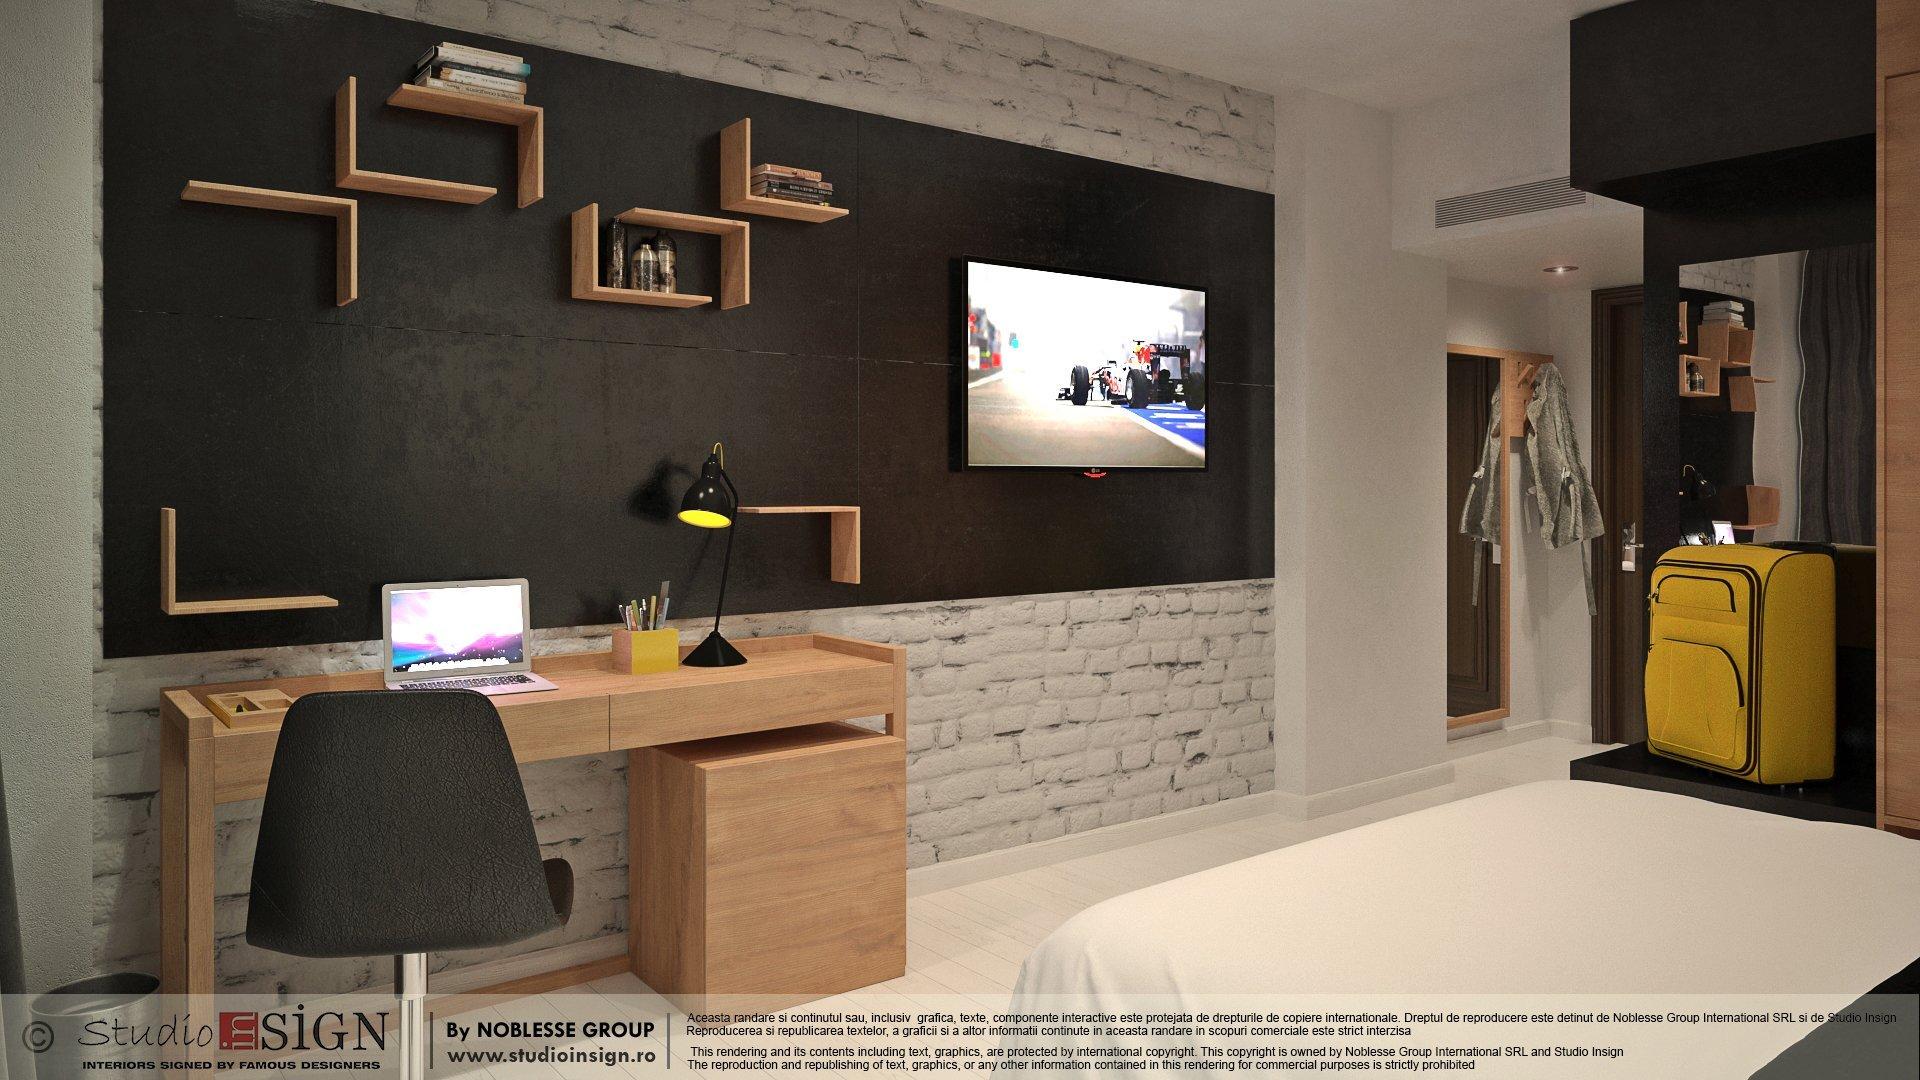 Proiect amenajare camera hotel in stil loft industrial newyorkez-seara-1